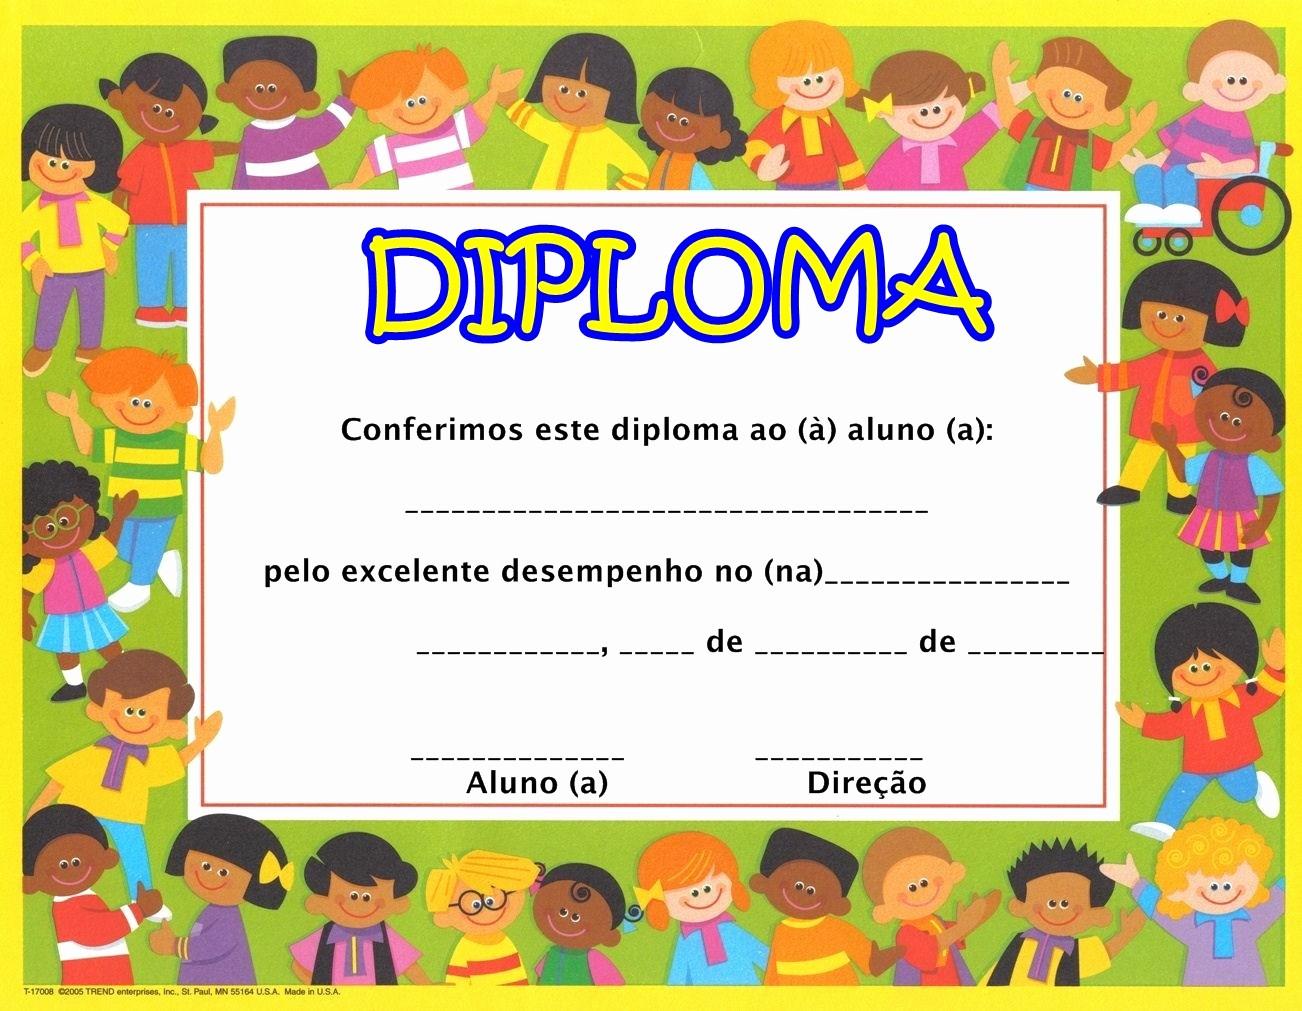 Modelos De Diplomas Para Editar Unique Modelos De Diplomas EducaÇo Infantil Para Imprimir